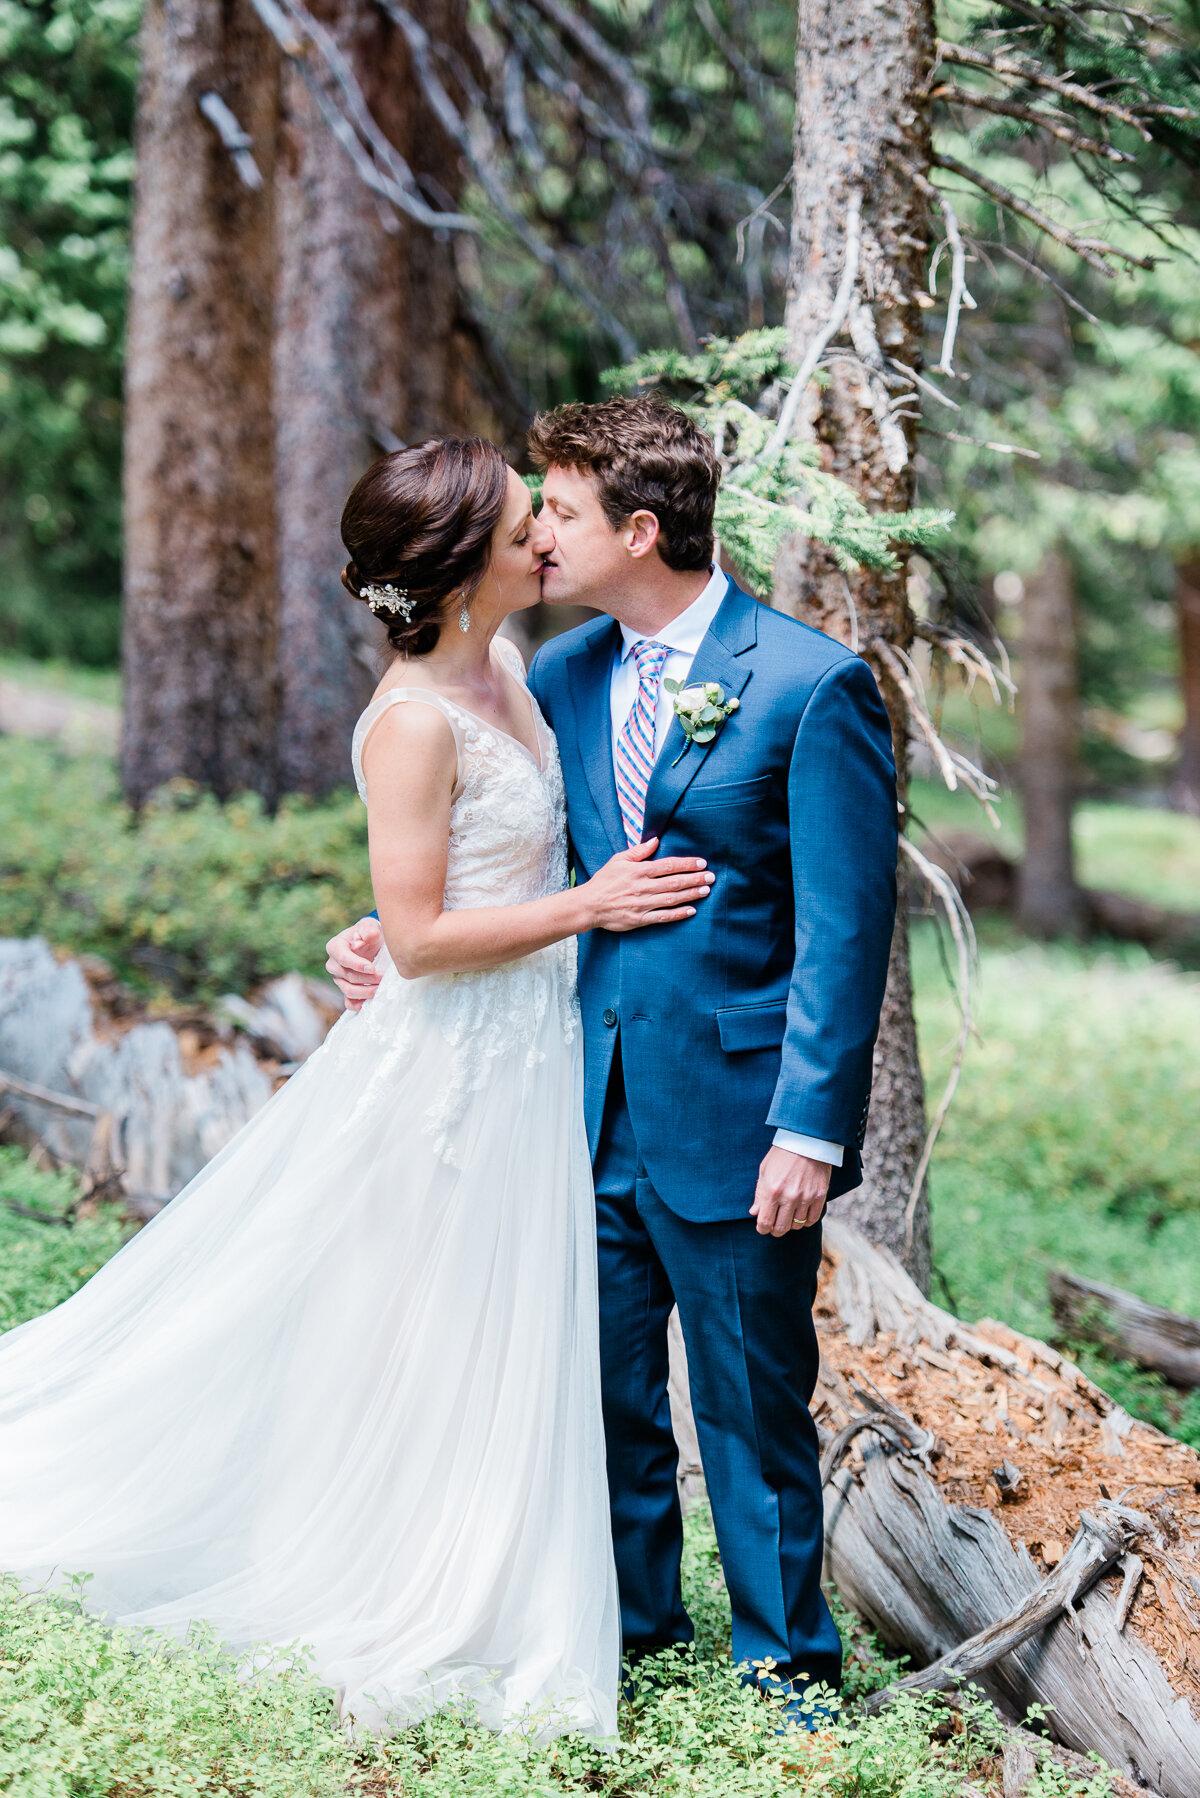 AshleighMillerPhotography-Wedding-Natalia-Matt-ArapahoeBasin-Colorado-16.jpg